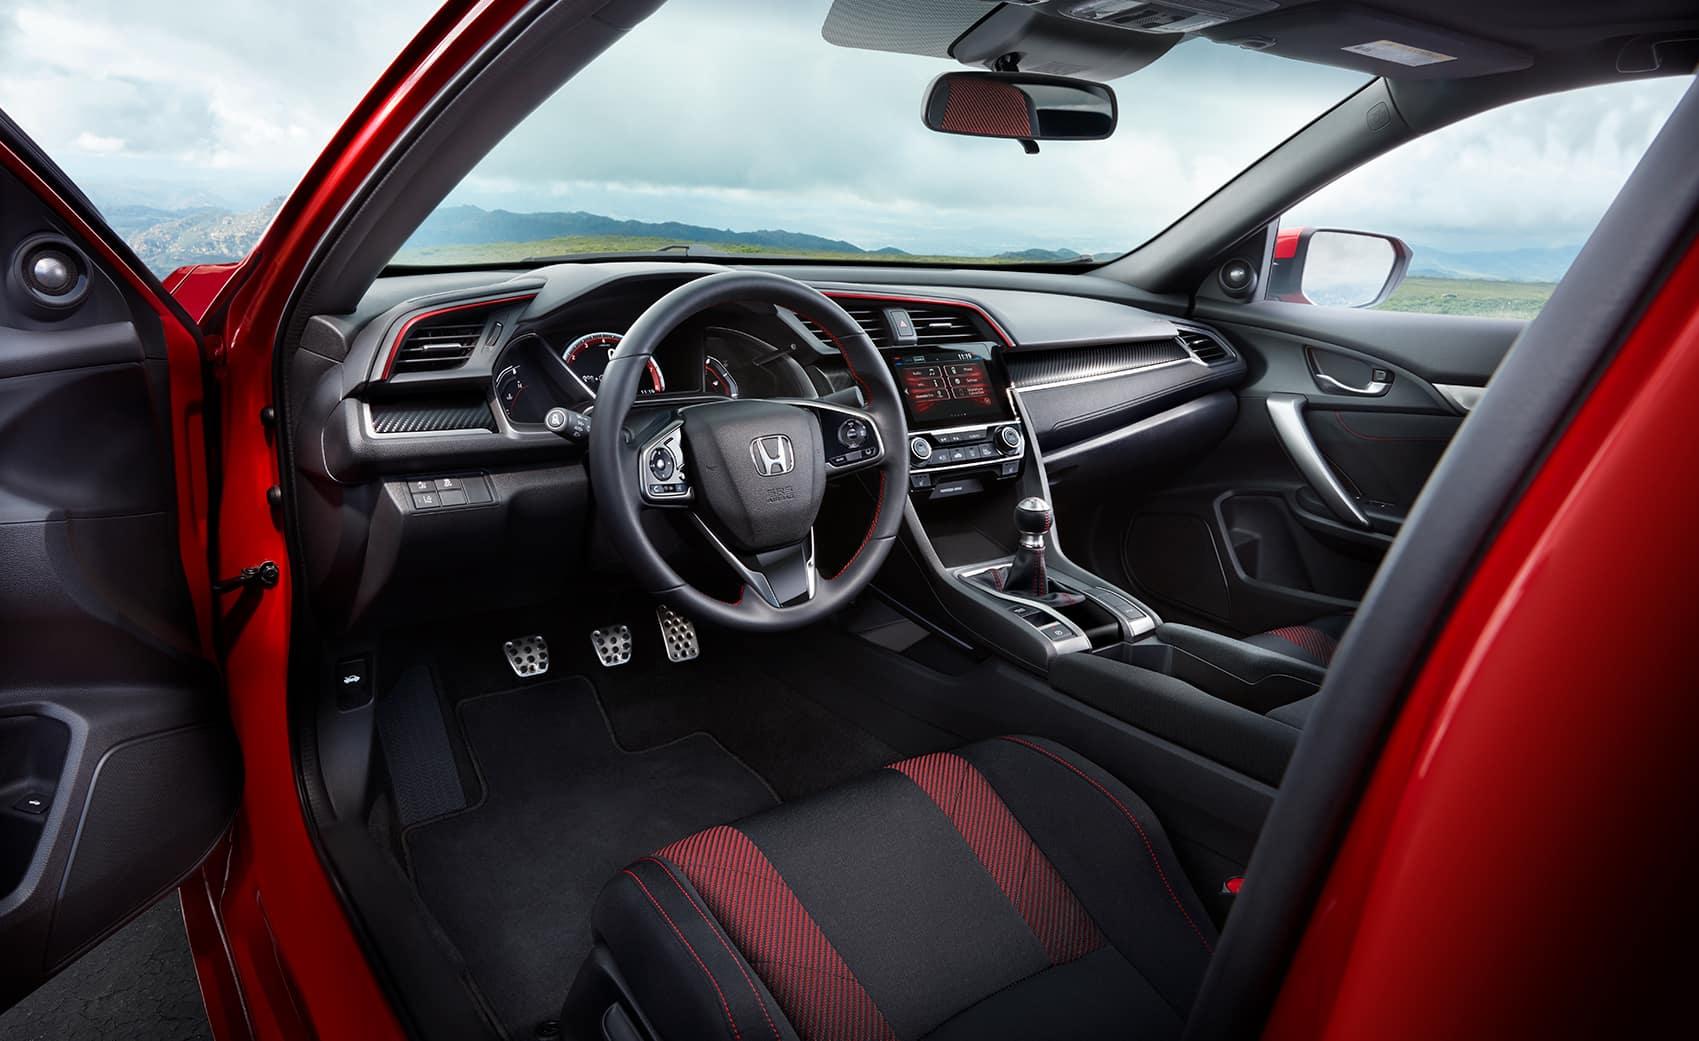 Comparison of the 2020 Civic Sedan vs. the 2020 Accord at Boch Honda West of Westford MA | the interior of the 2020 honda civic